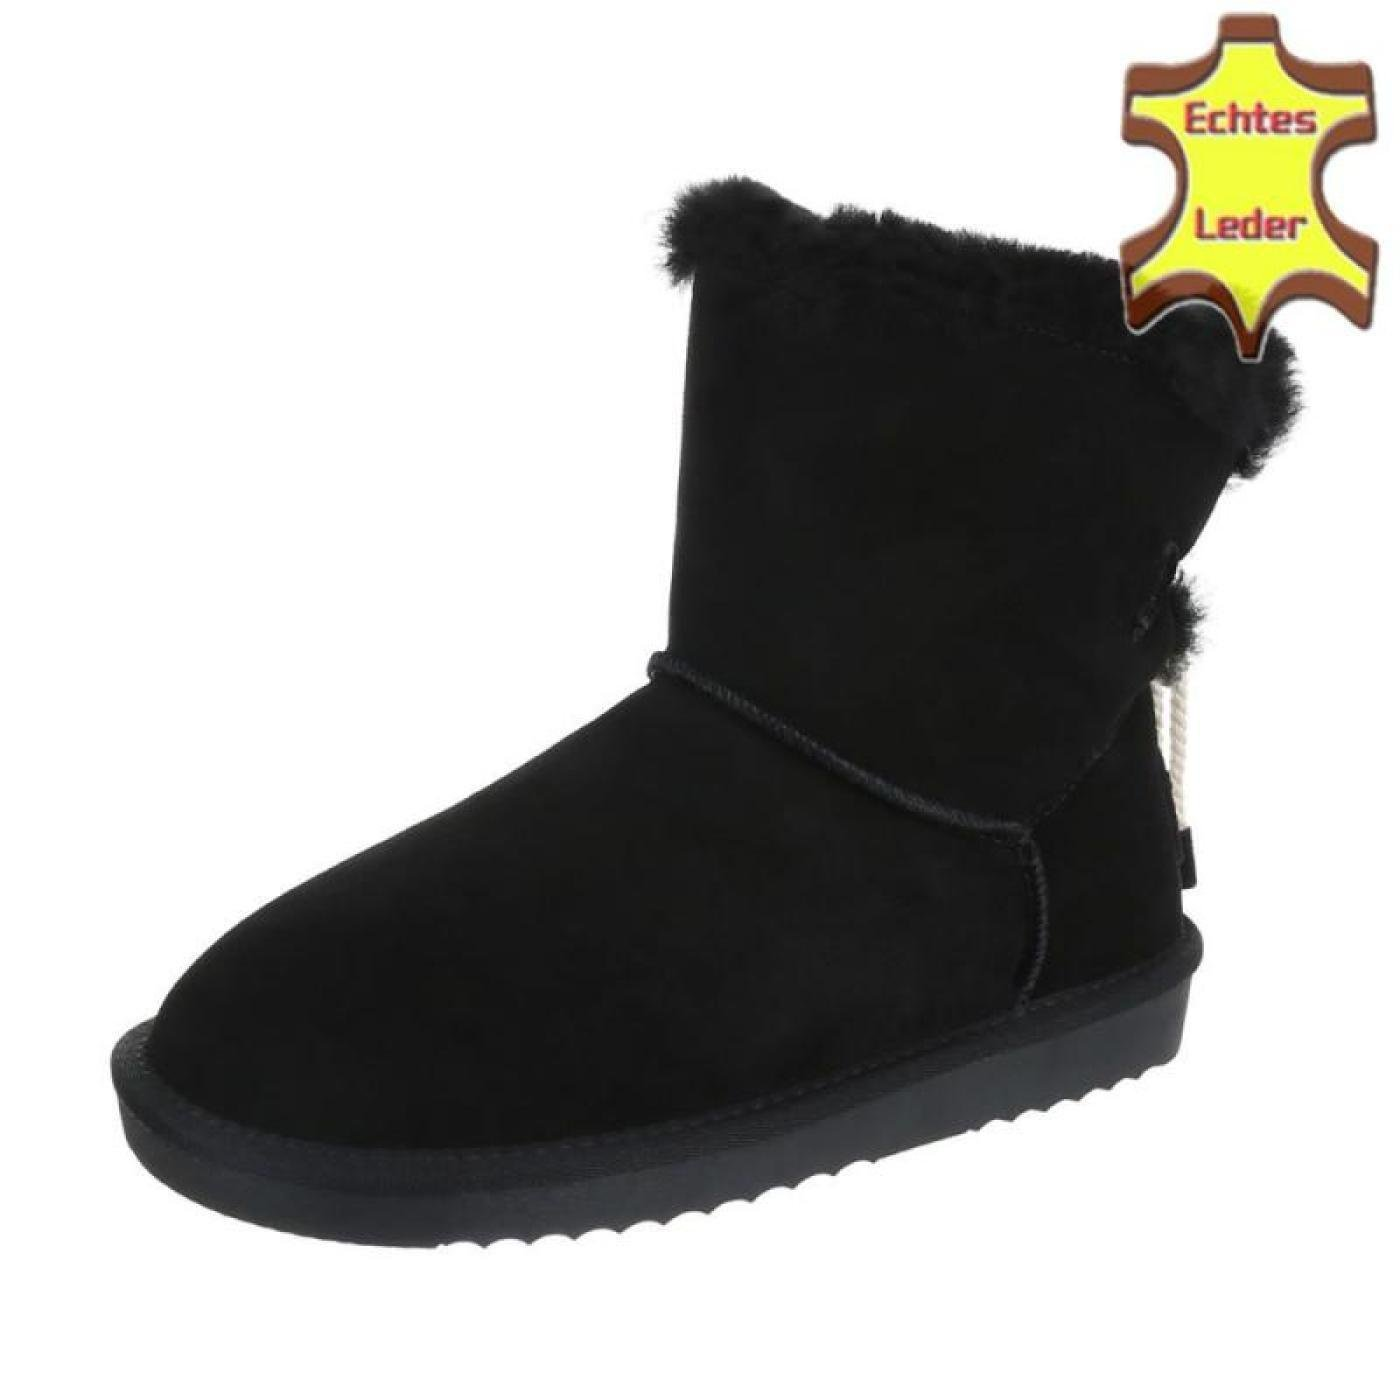 Cingant Woman Damen Schuhe/Damenschuhe/Stiefel/Leder/Schwarz Stiefel/Flache Profilsohle/Gefütterte Schuhe/Damenschuhe/Stiefel/Leder/Schwarz Damen - 7dd17b